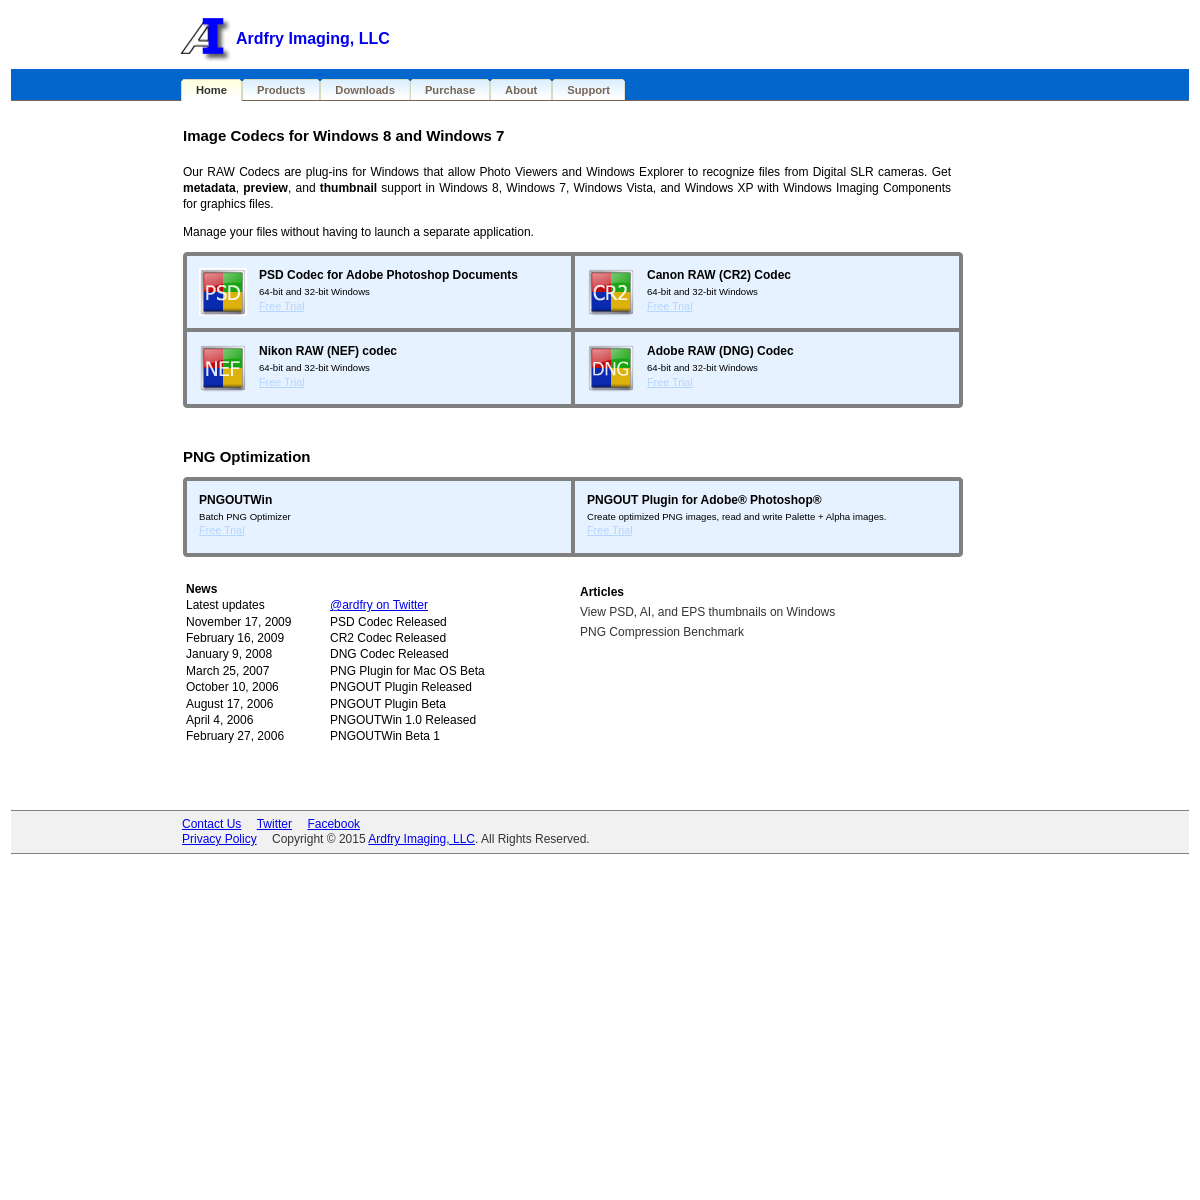 Ardfry Imaging, LLC